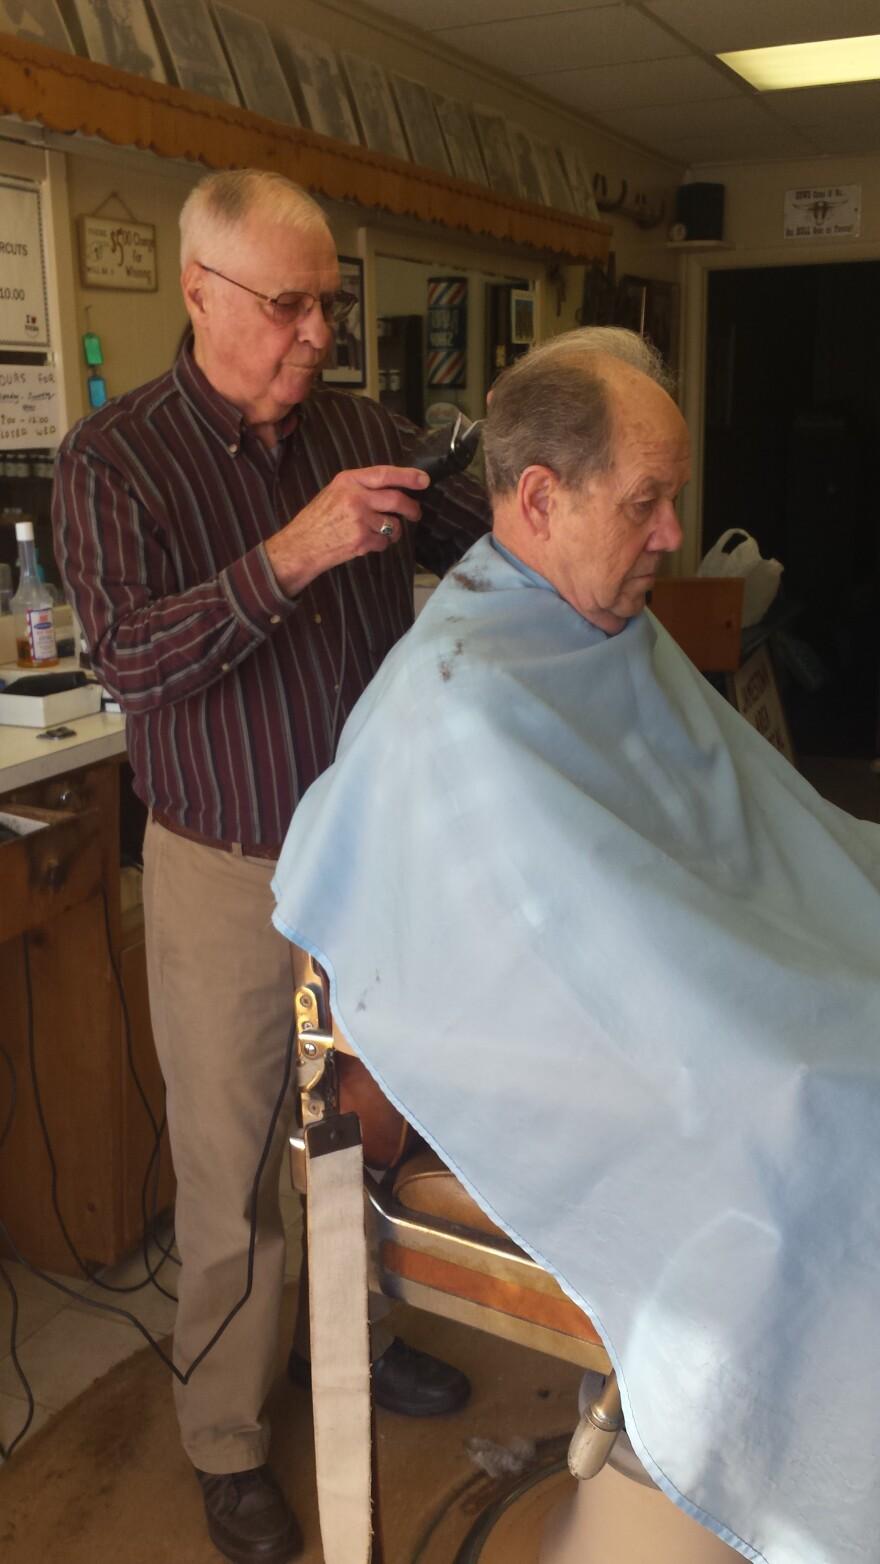 Ted Sessler's barber shop sits in the center of the village of Jamestown.